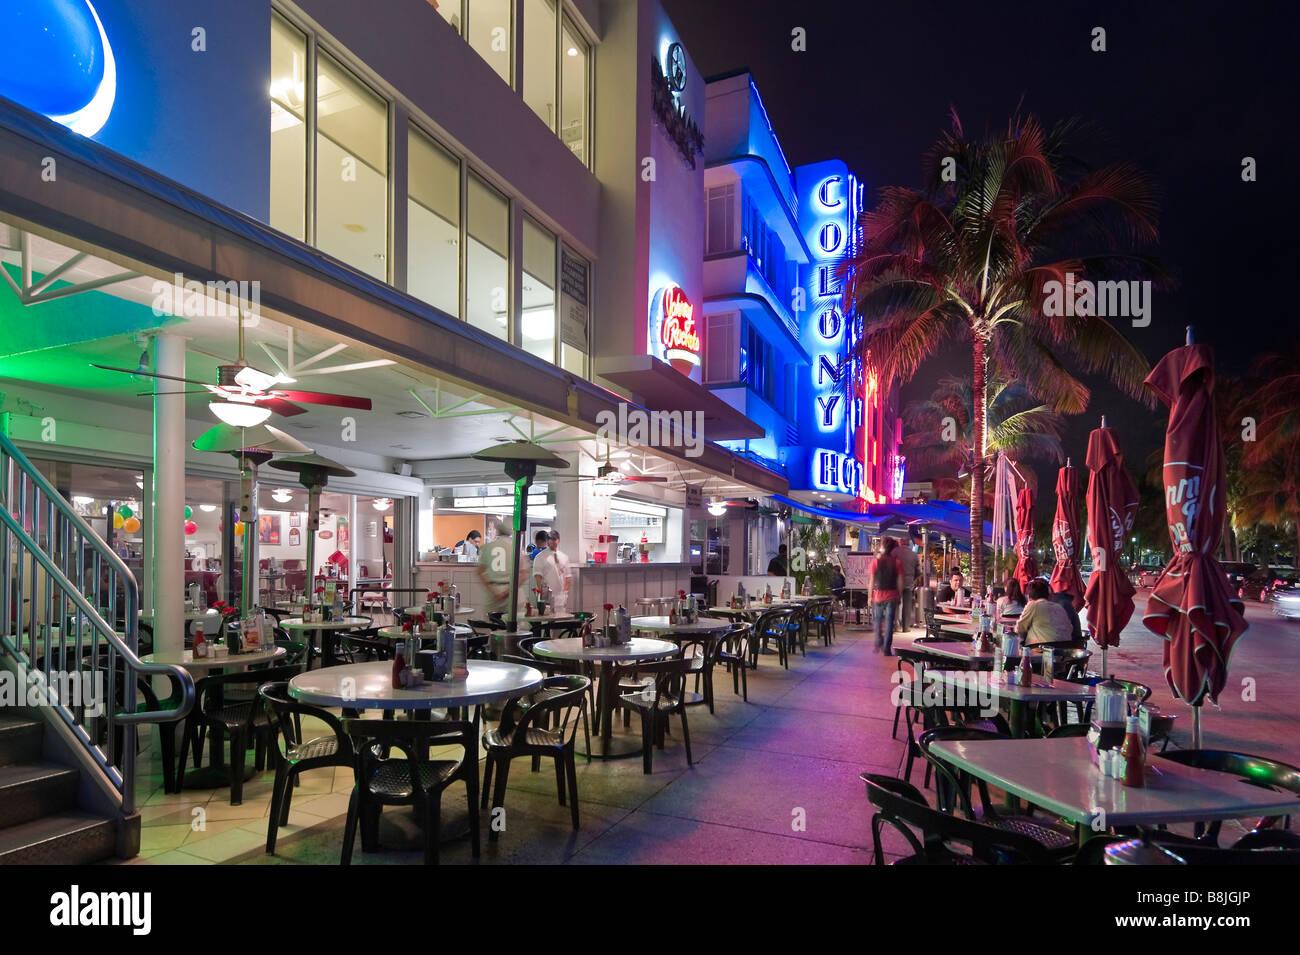 Johnny Rockets Restaurant at night on Ocean Drive, Art Deco district, South Beach, Miami Beach, Gold Coast, Florida, - Stock Image